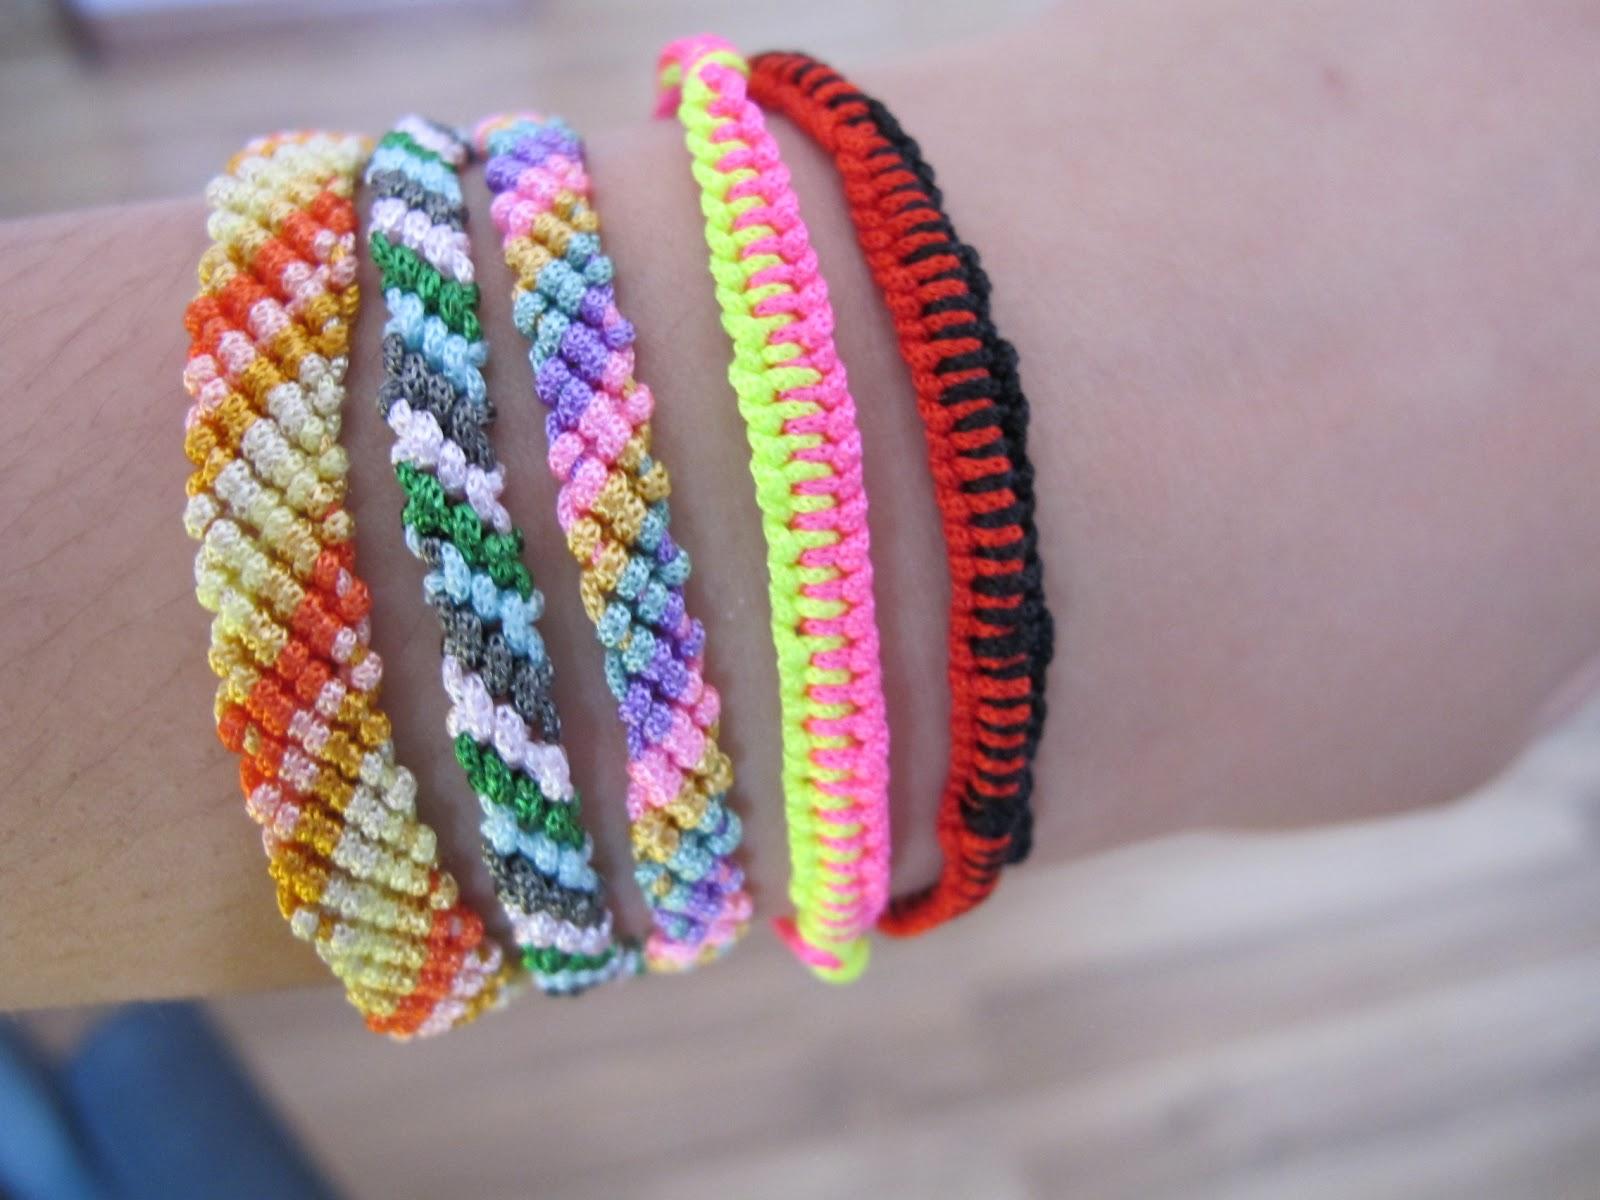 Fun Diy Projects For Bedrooms Shopaholic S Got Cash Diy Friendship Bracelets